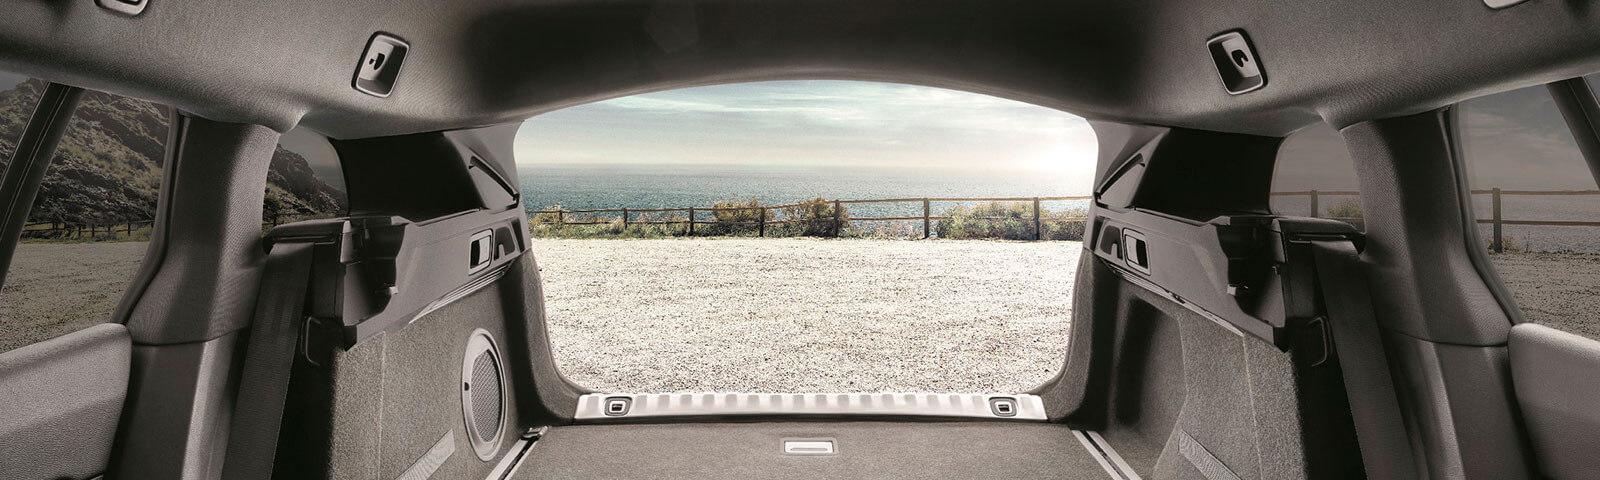 Magic Flat: Nuevo Peugeot 508 SW, referente en modularidad